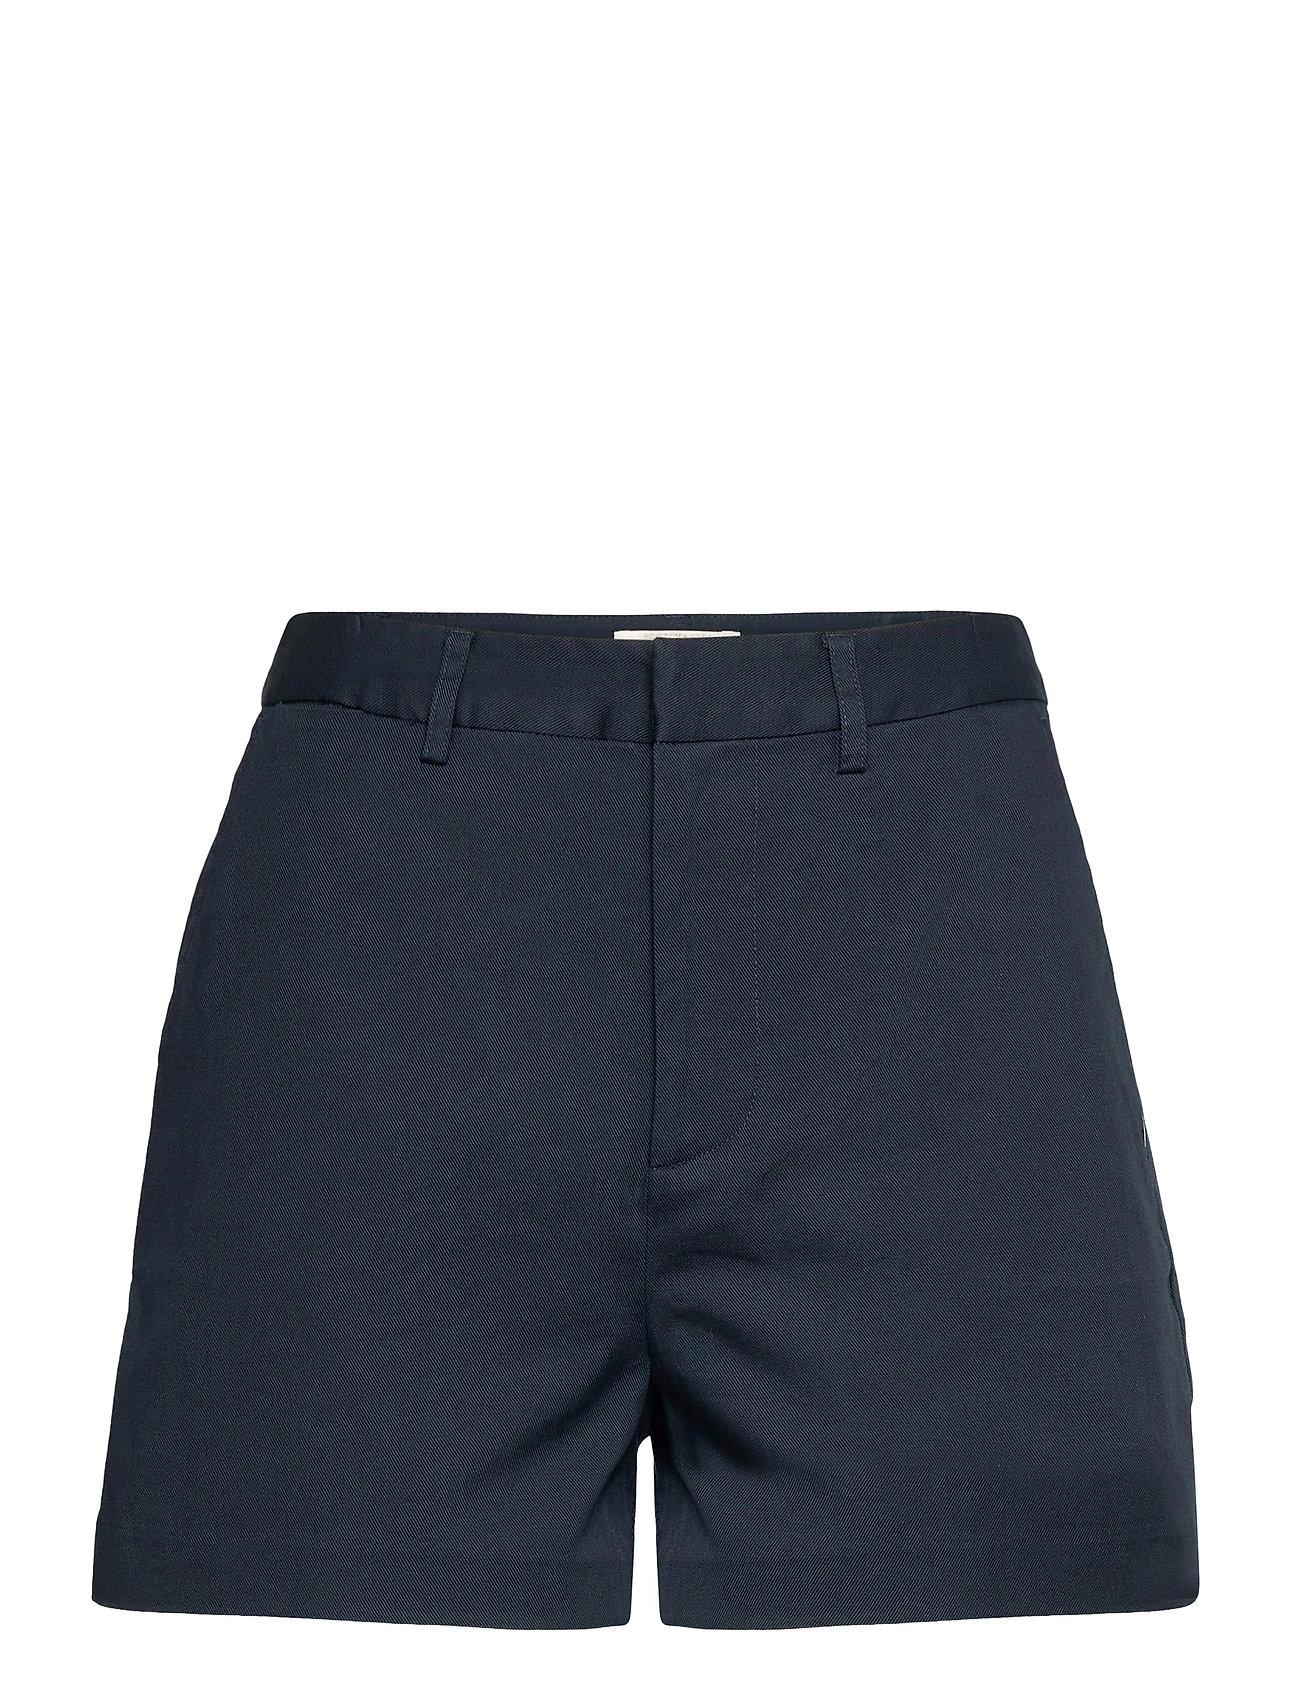 Image of 'Abott' Organic Cotton Chino Shorts Shorts Chino Shorts Blå Scotch & Soda (3500881763)